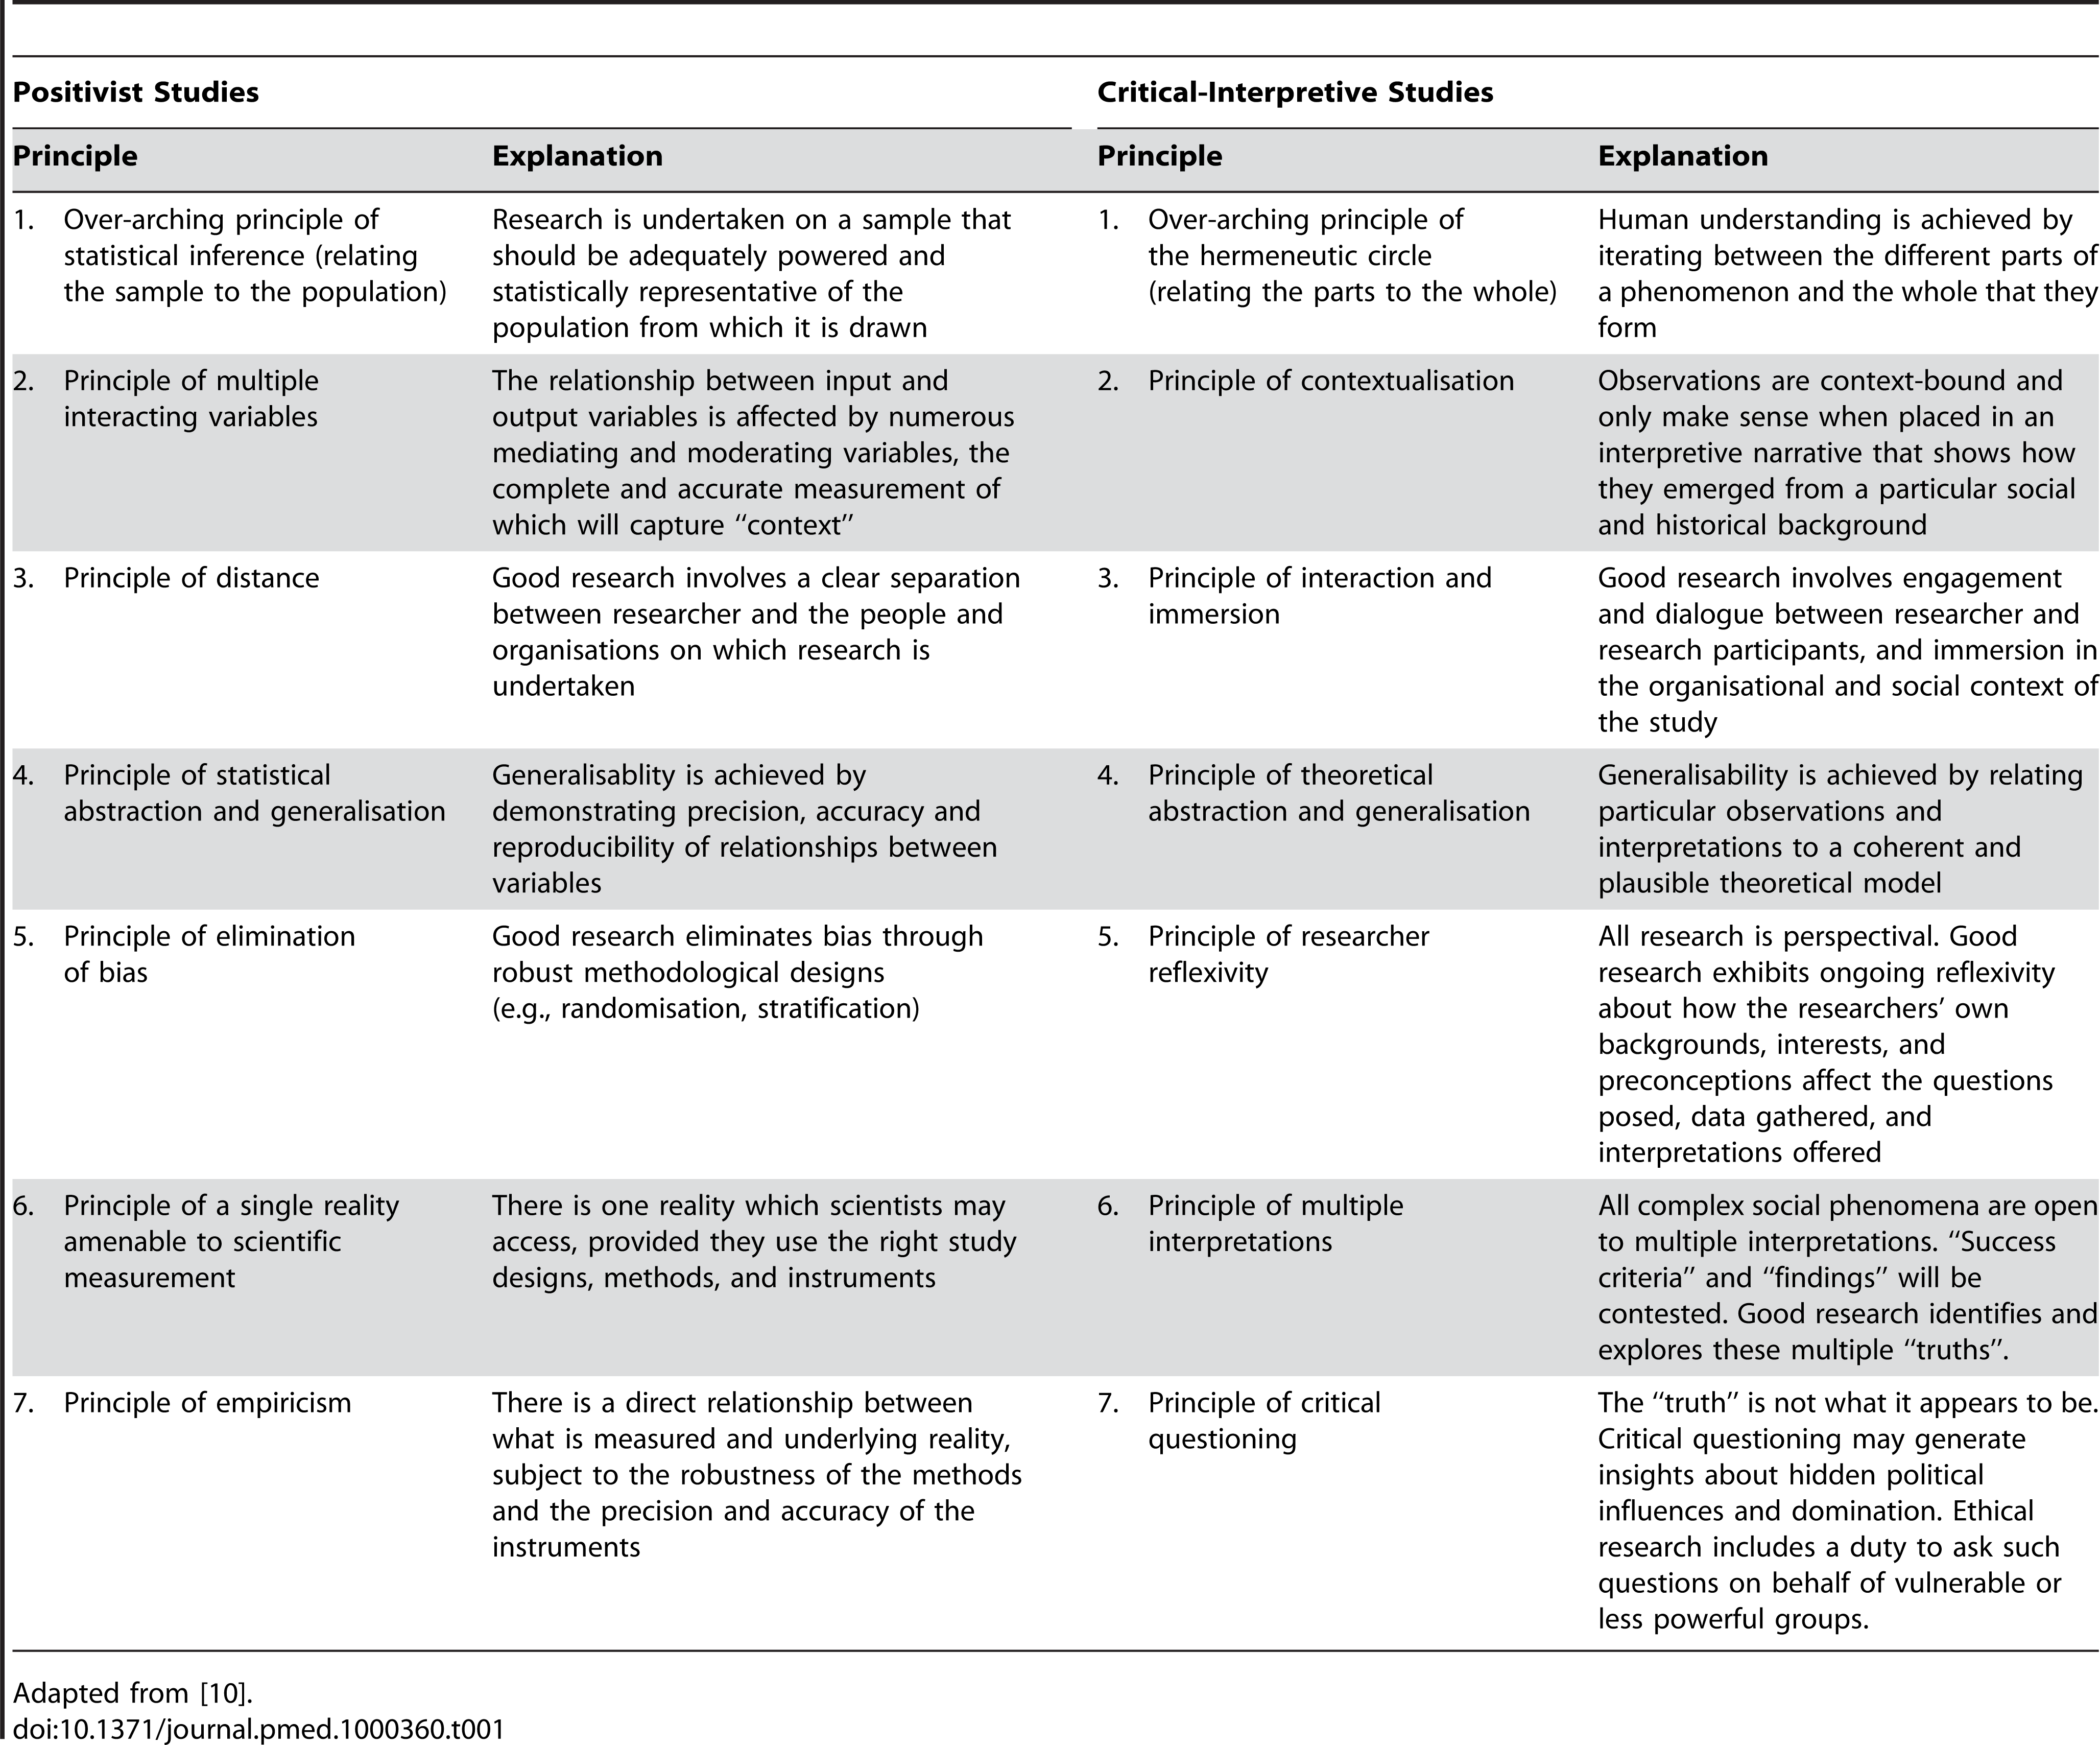 Comparison of Key Quality Principles in Positivist versus Critical-Interpretivist Studies.